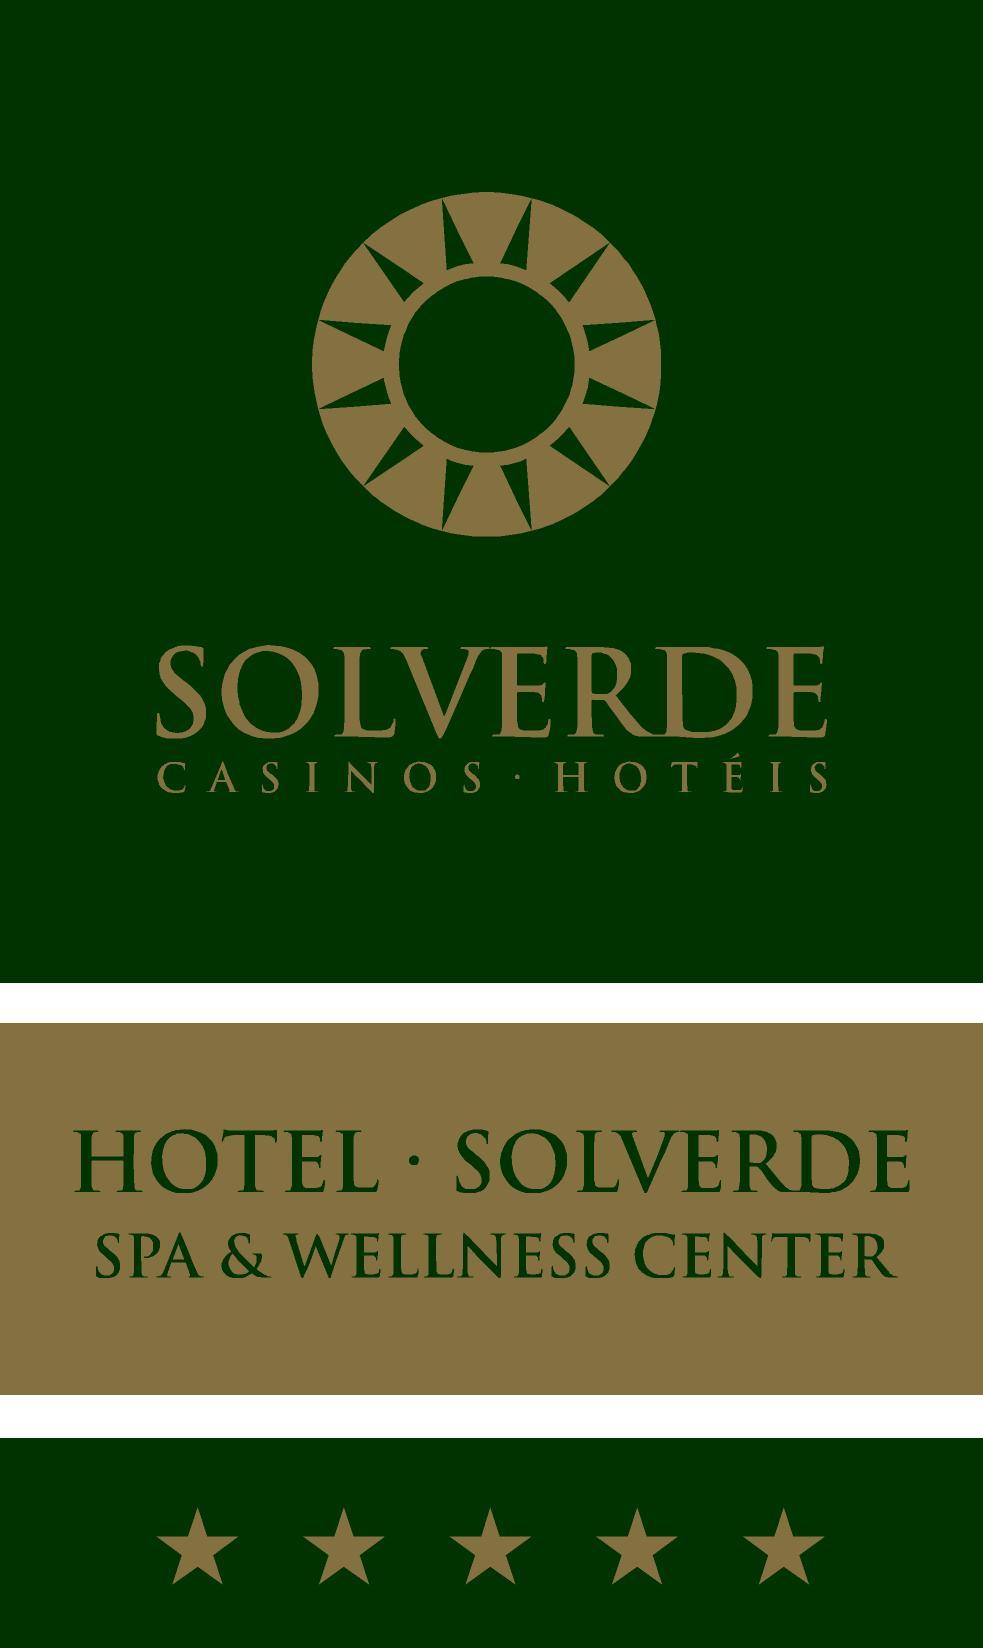 Hotel Solverde Spa